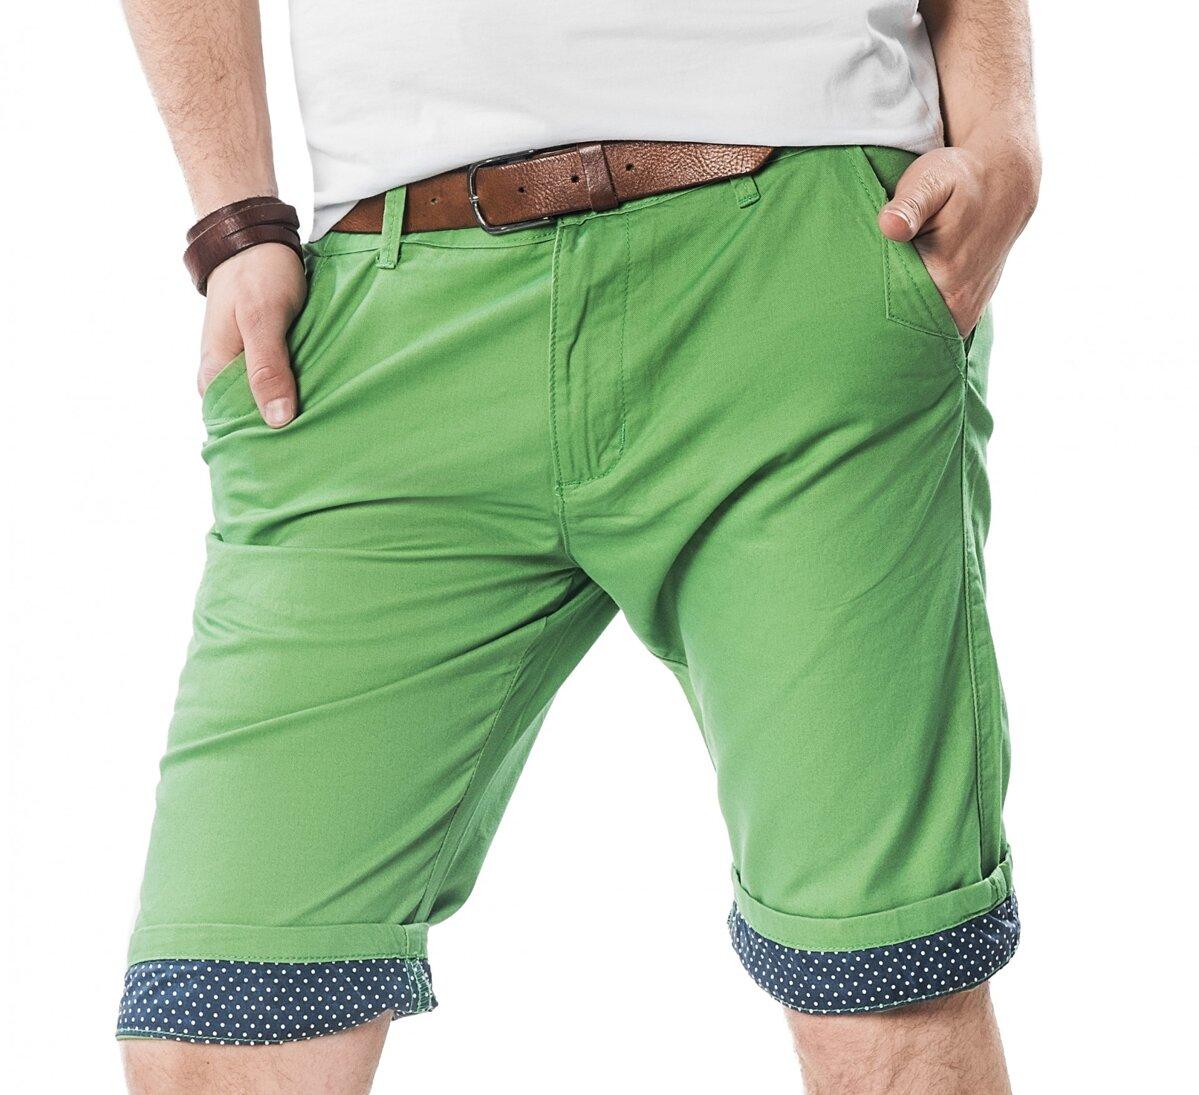 be996becb52b Moderné krátke pánske nohavice SKR- 01 zelené